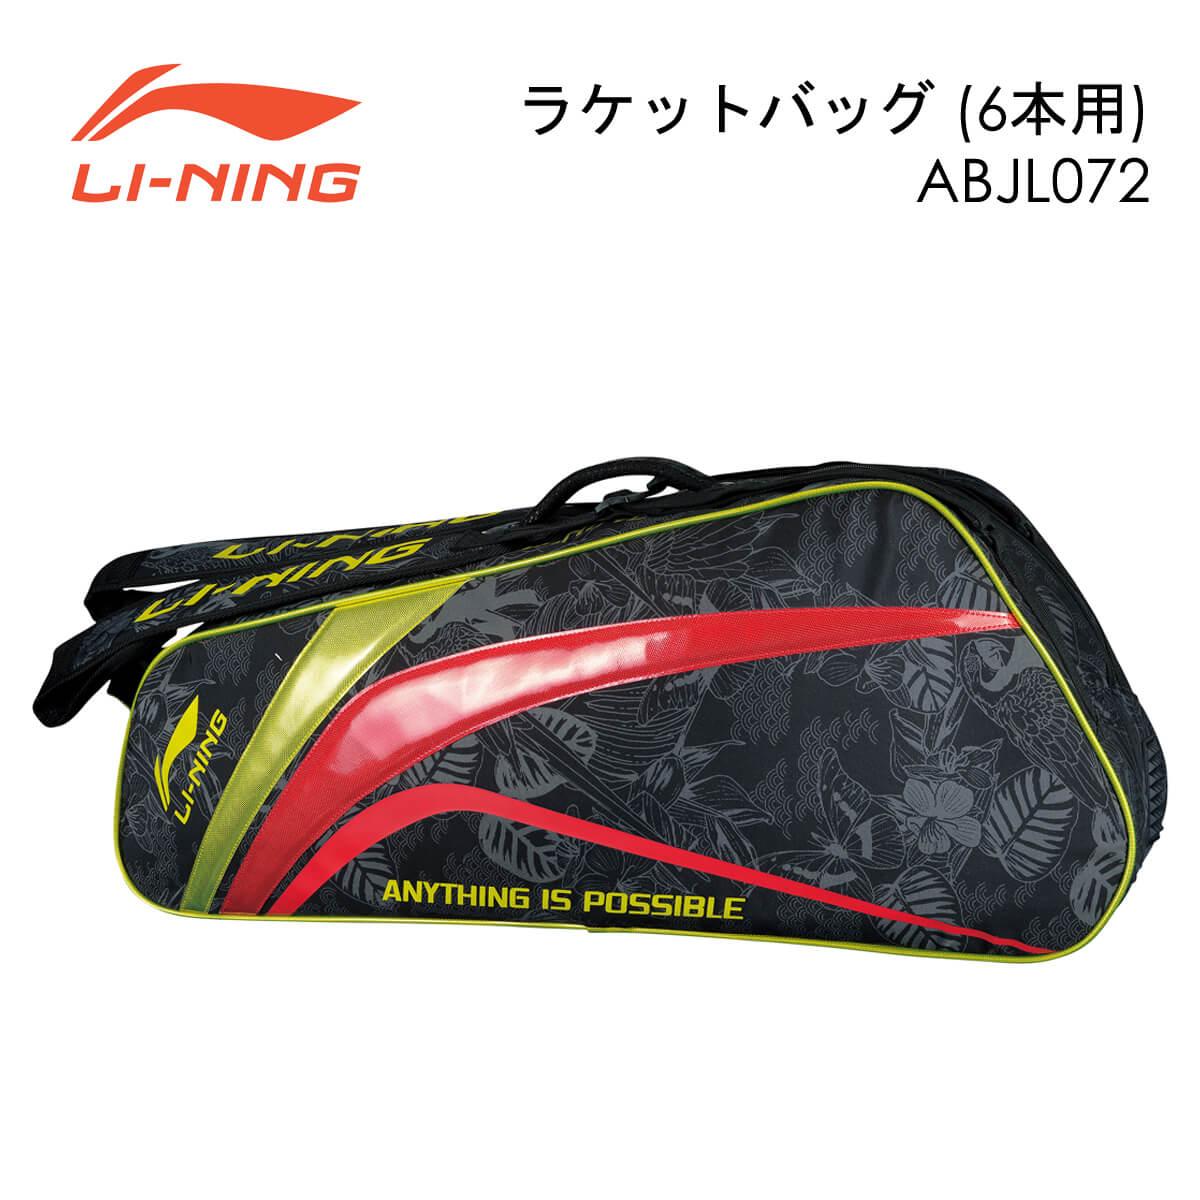 LI-NING ABJL072 ラケットバッグ(6本用) リーニン